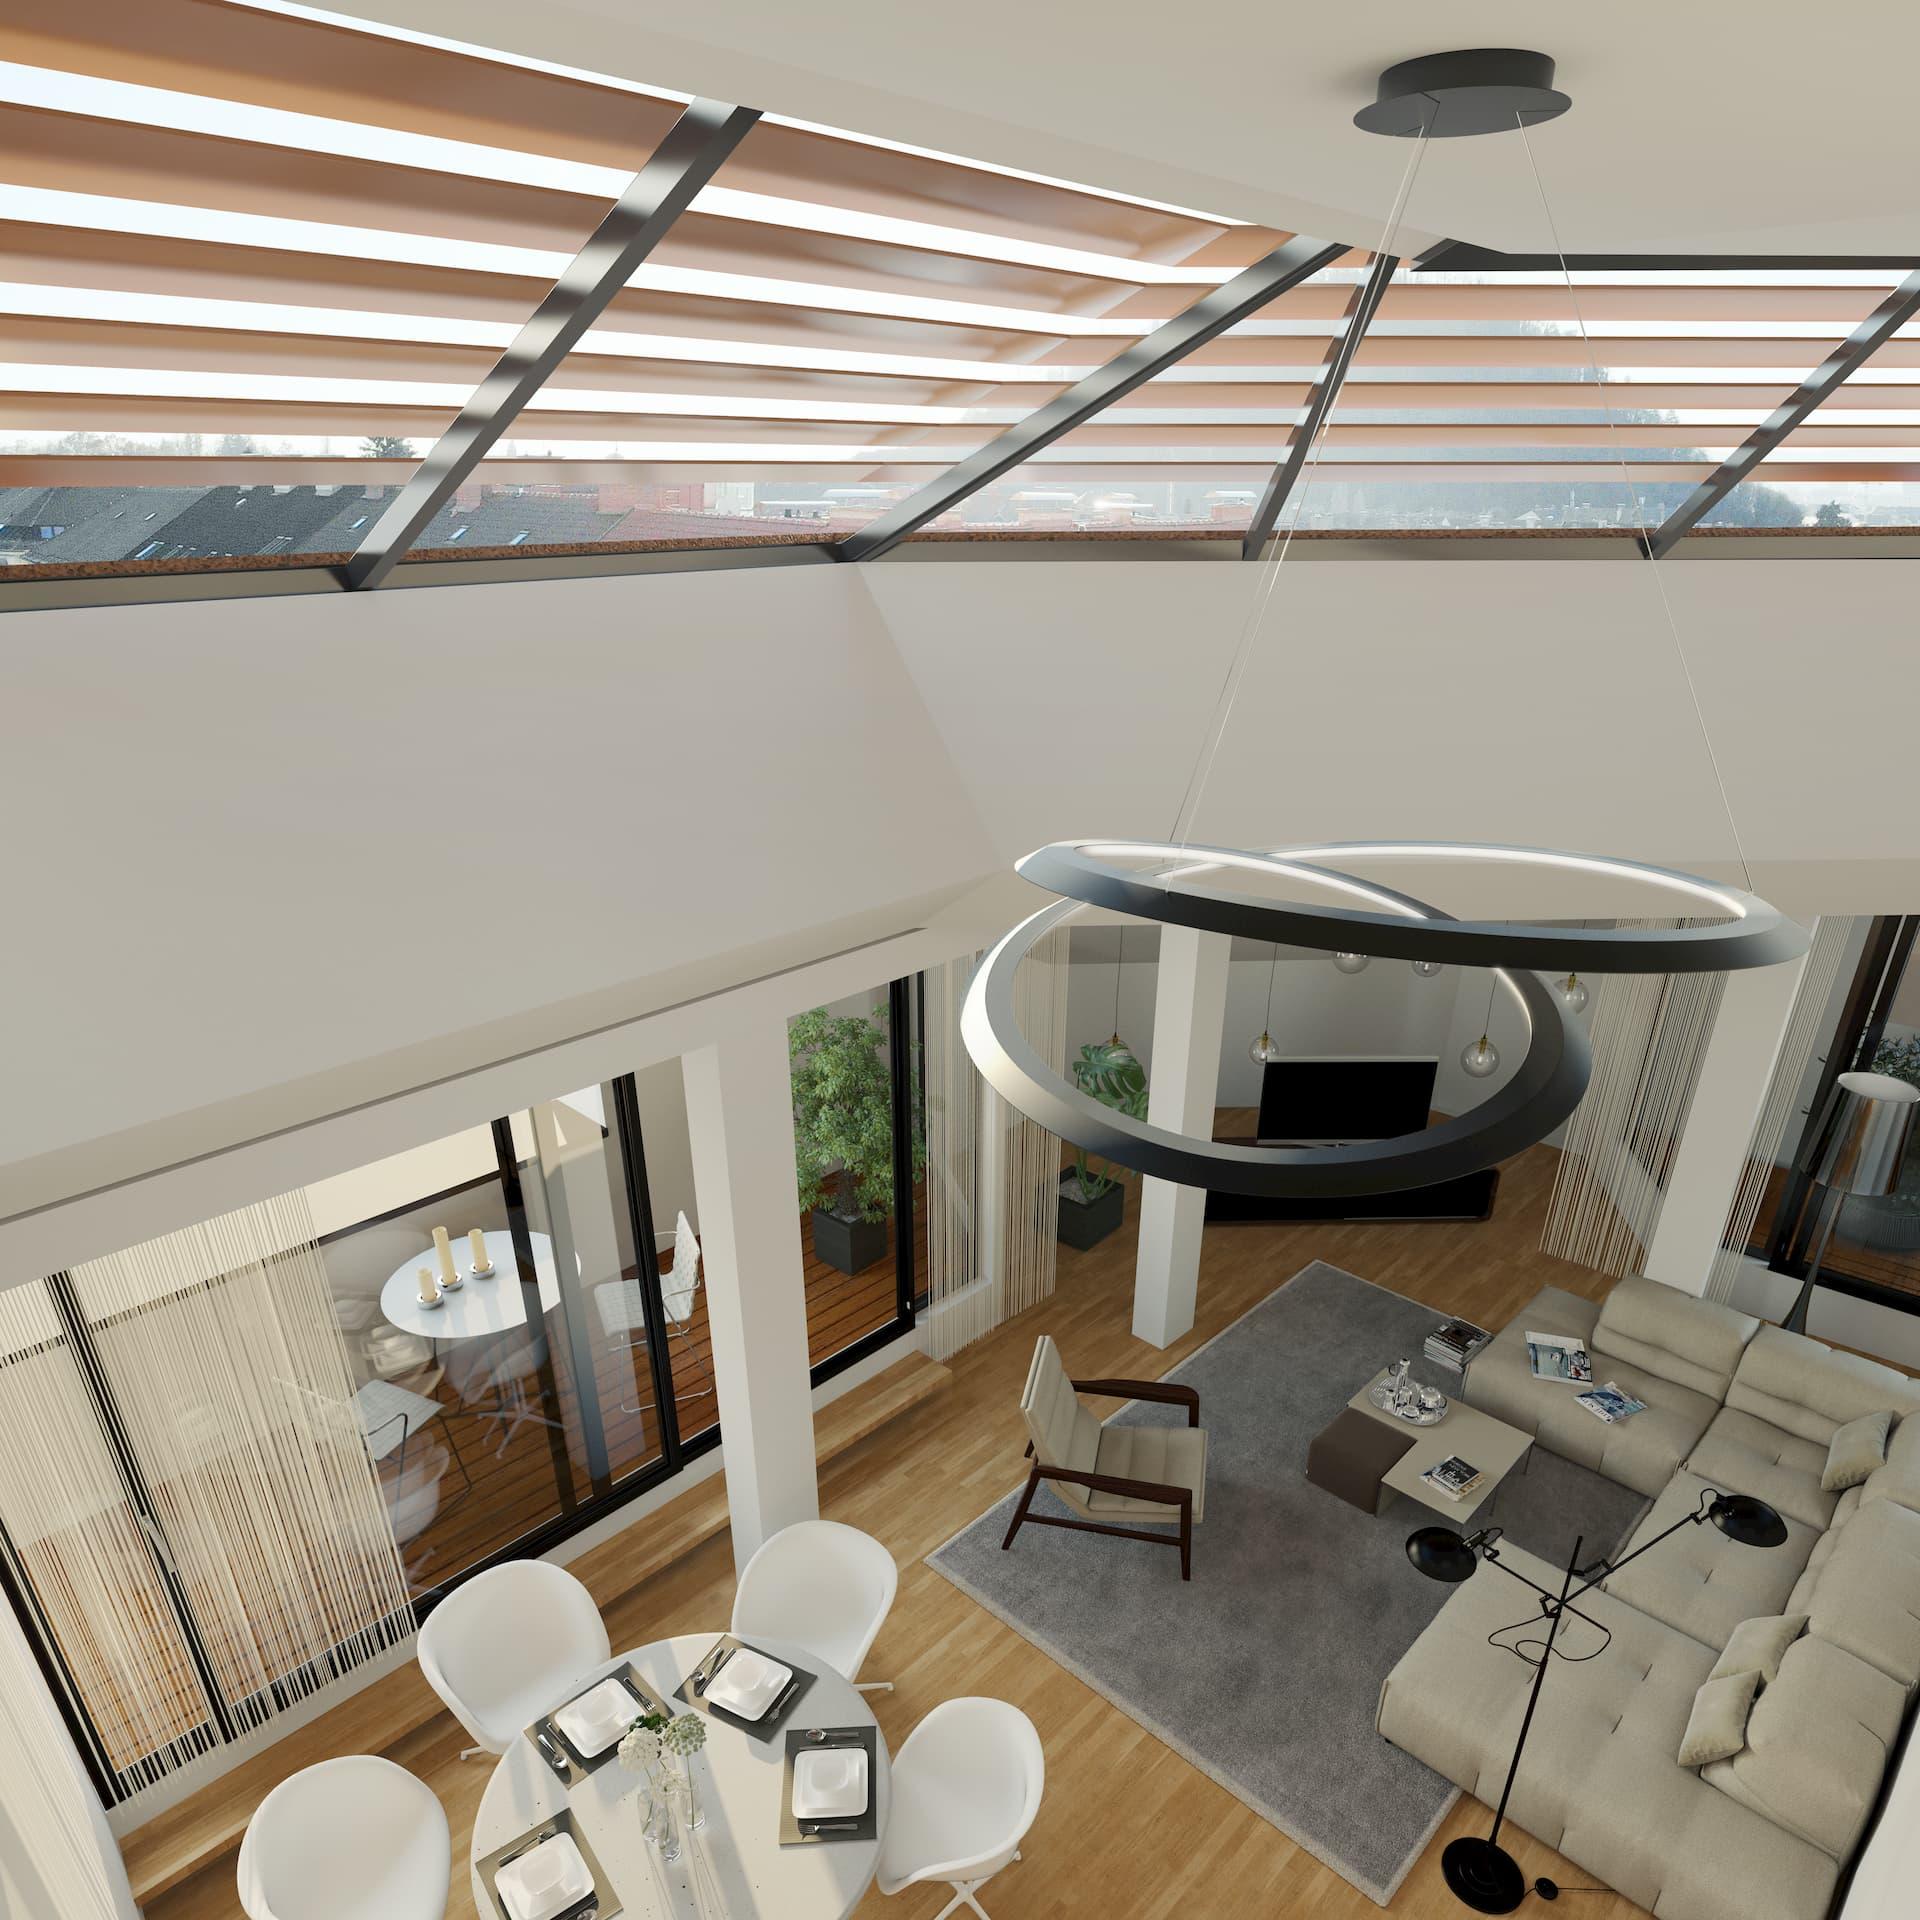 Innenansicht Dachbodenausbau Immola